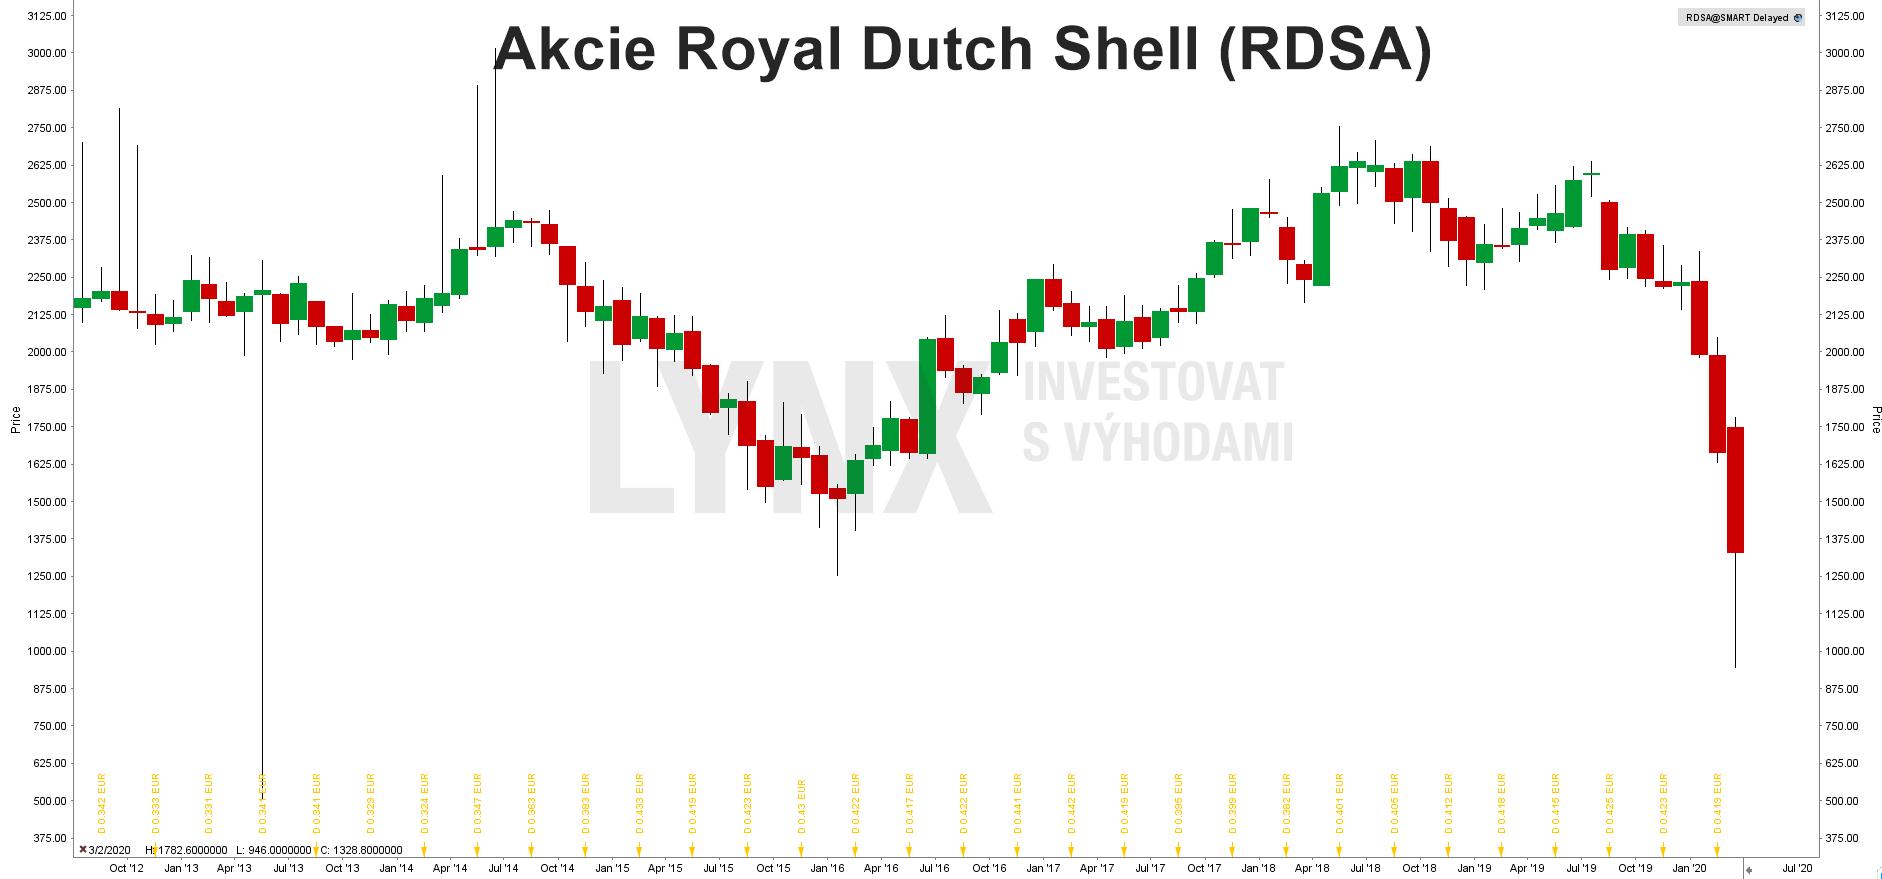 Grafakcie Royal Dutch Shell